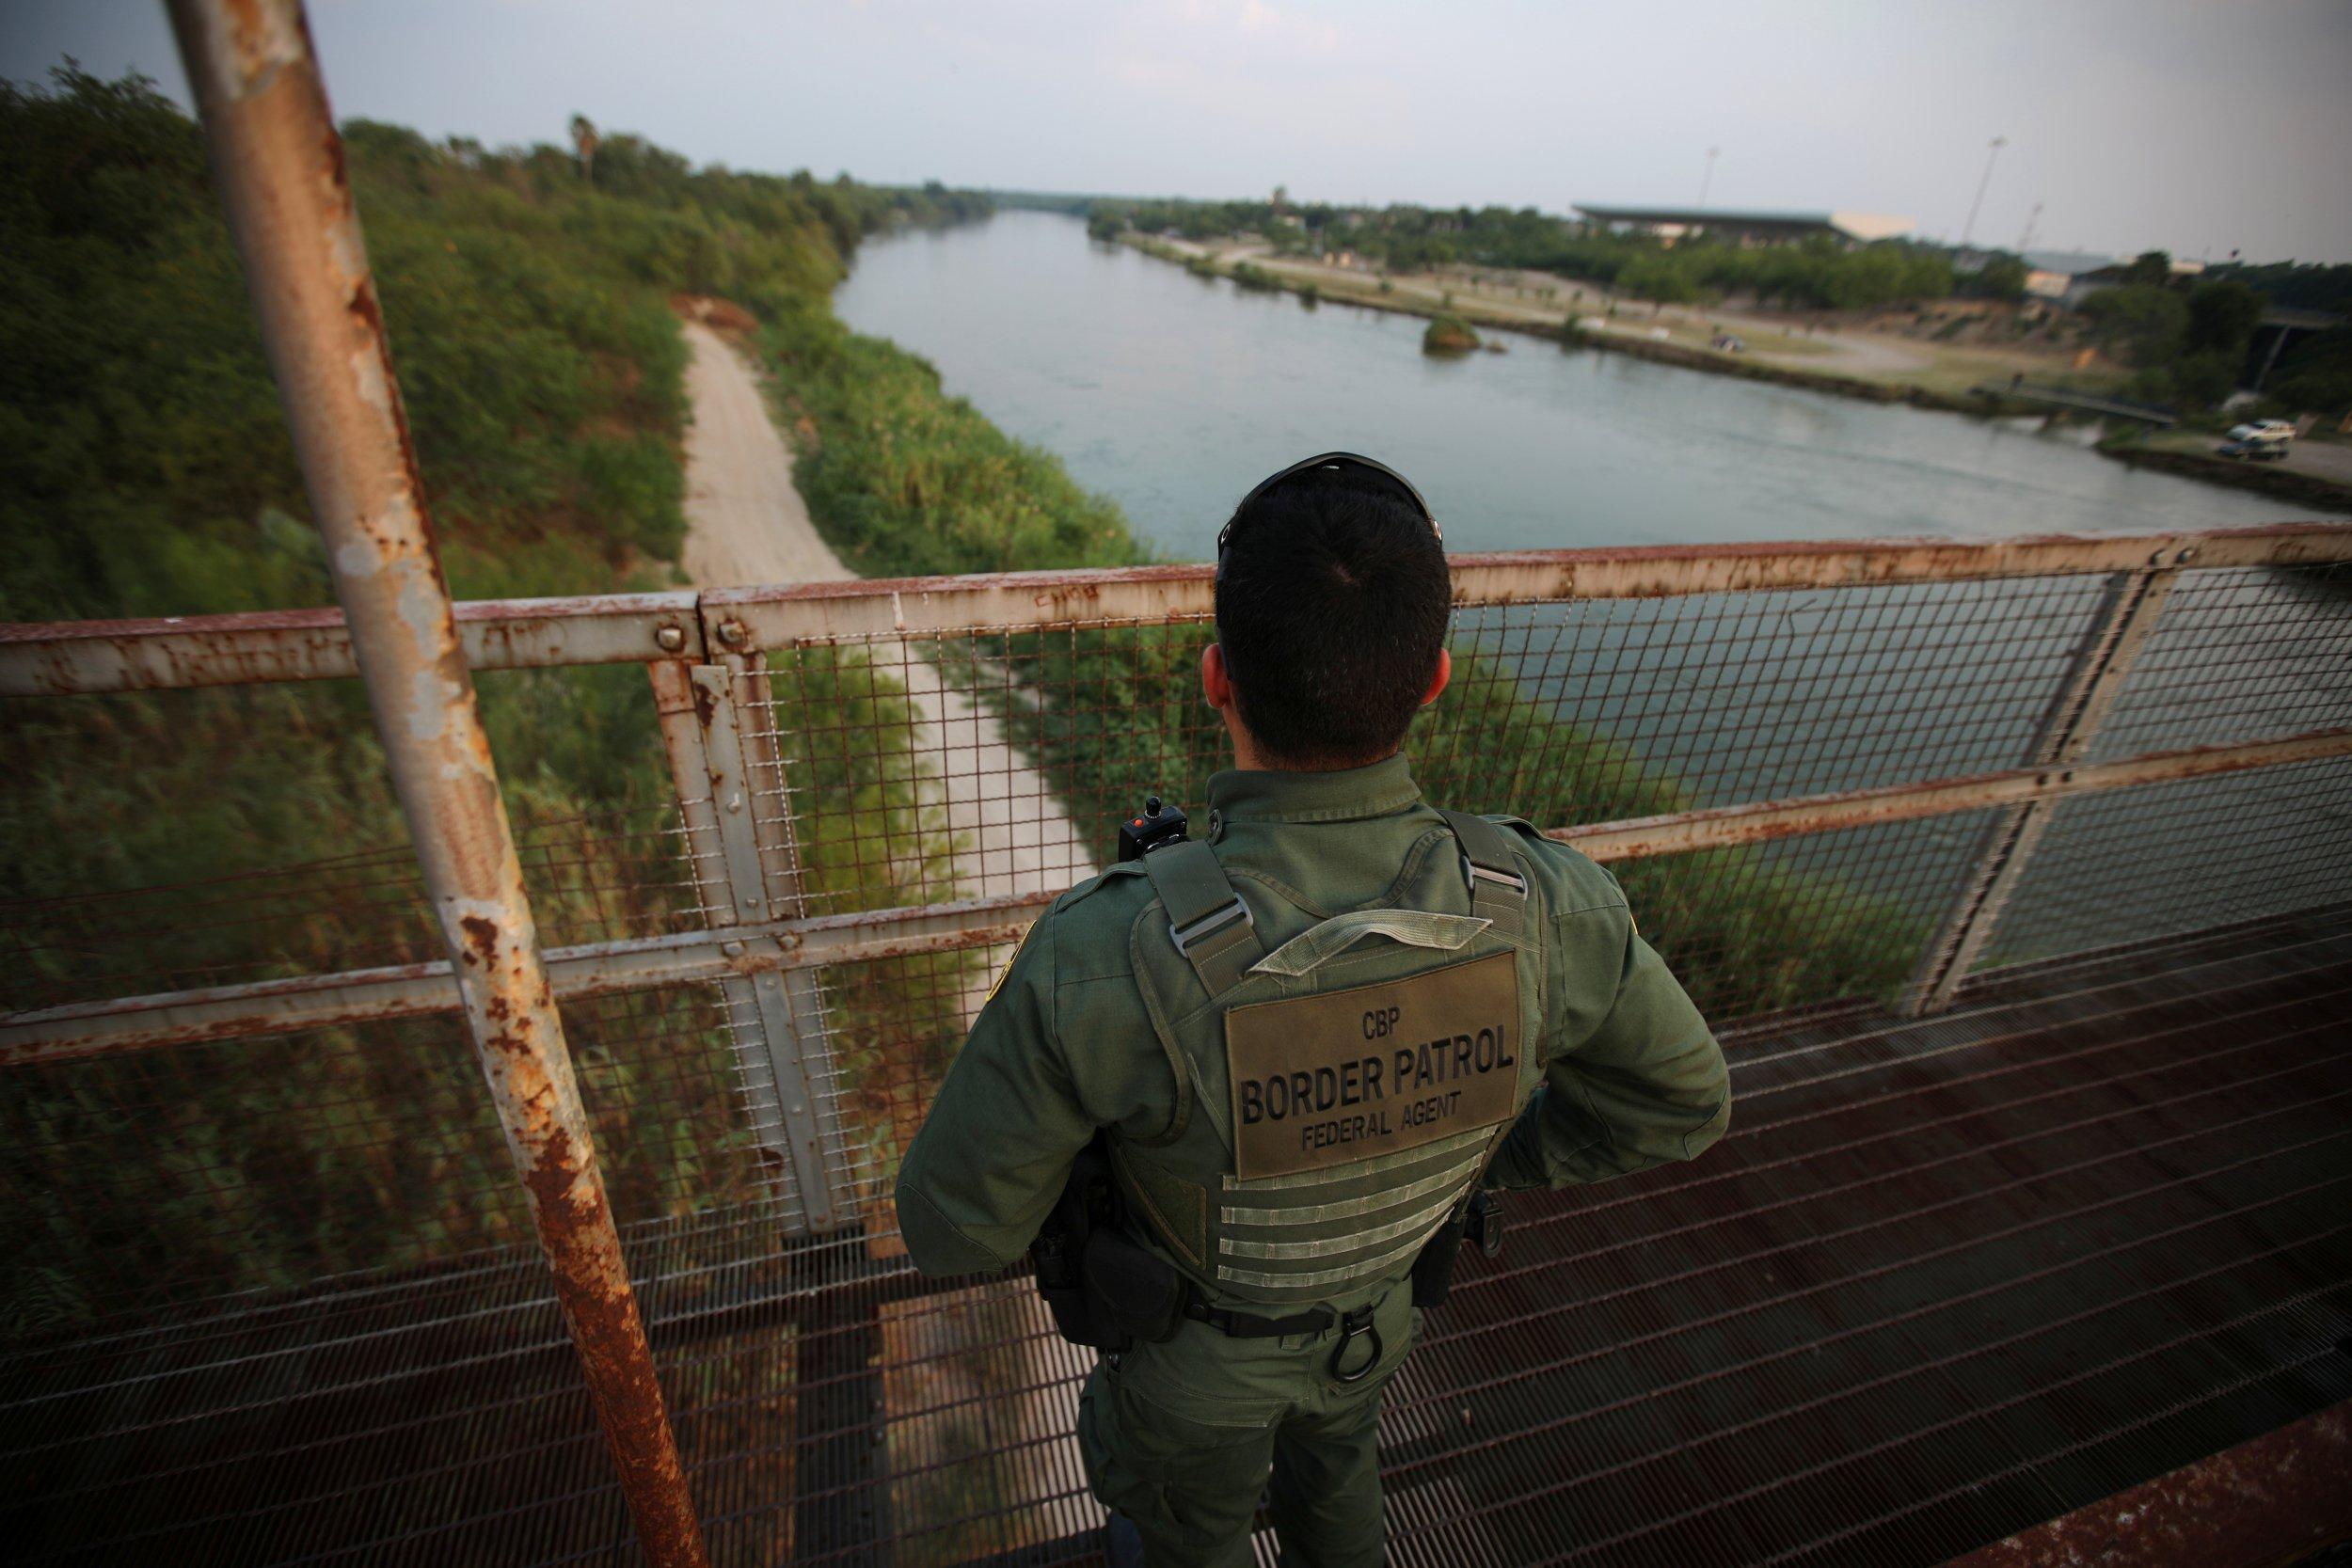 Border Patrol Agent - Cover Letter Resume Ideas ...